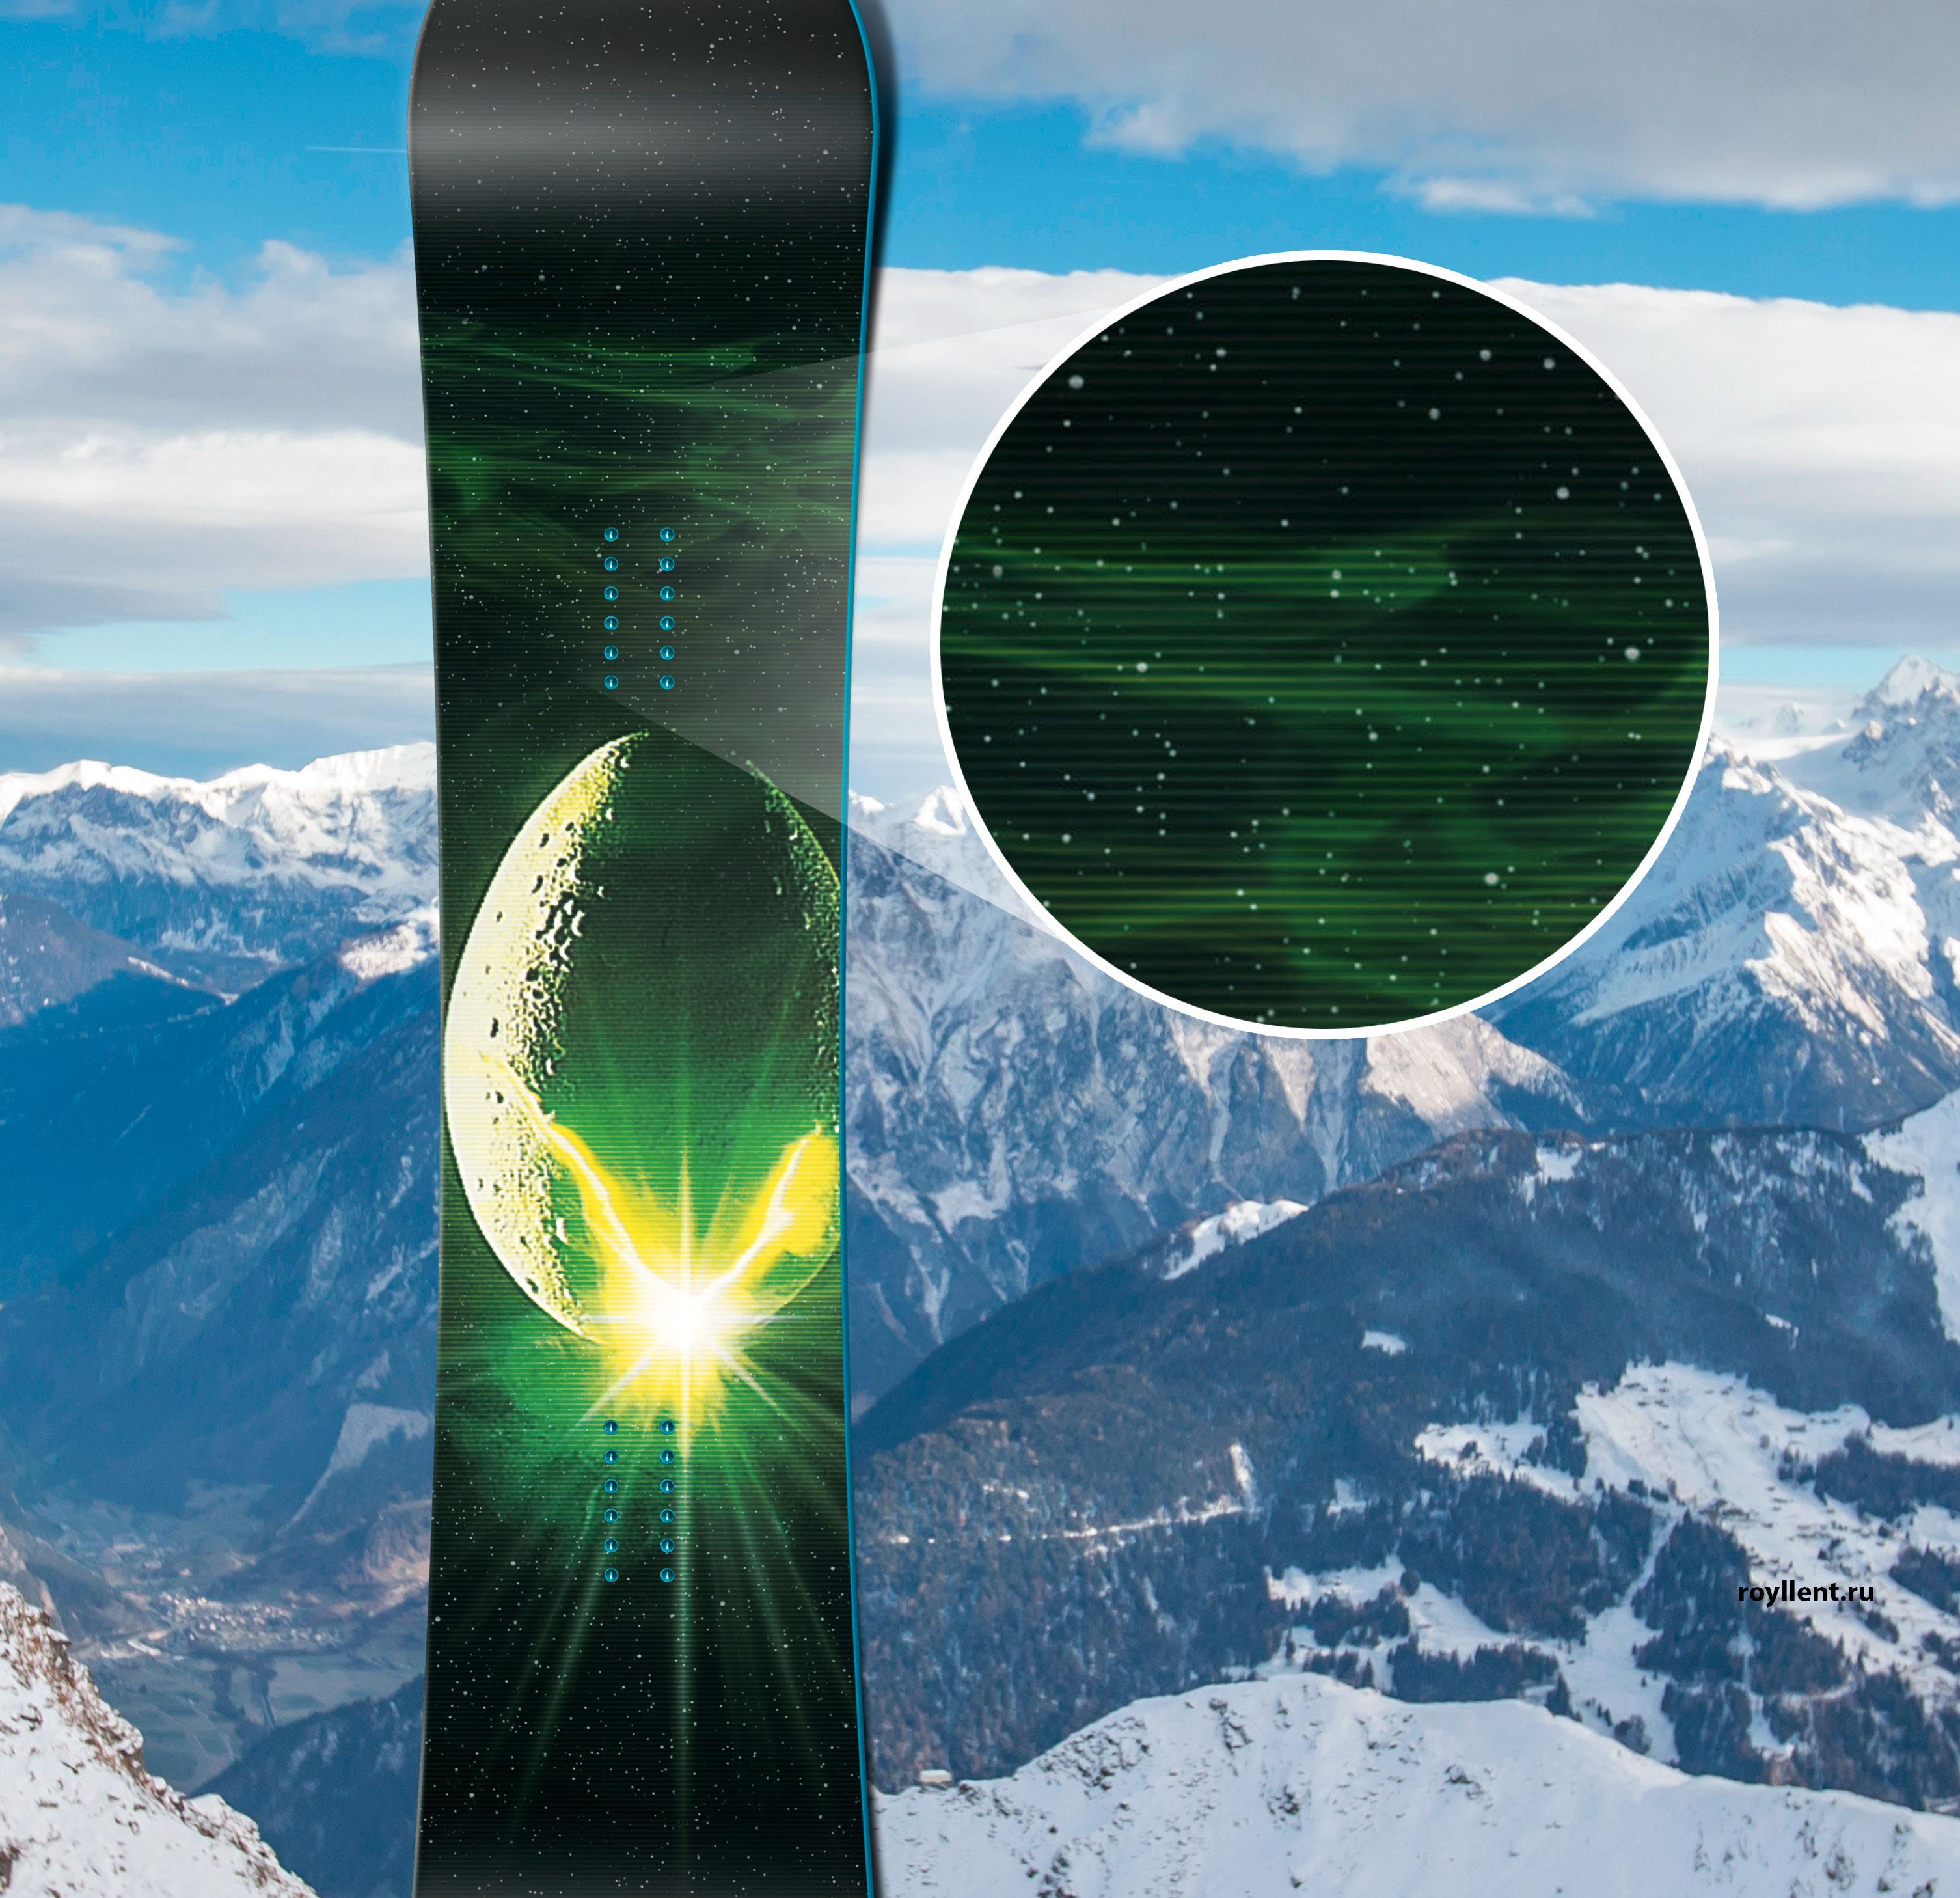 Design snowboard film Alian